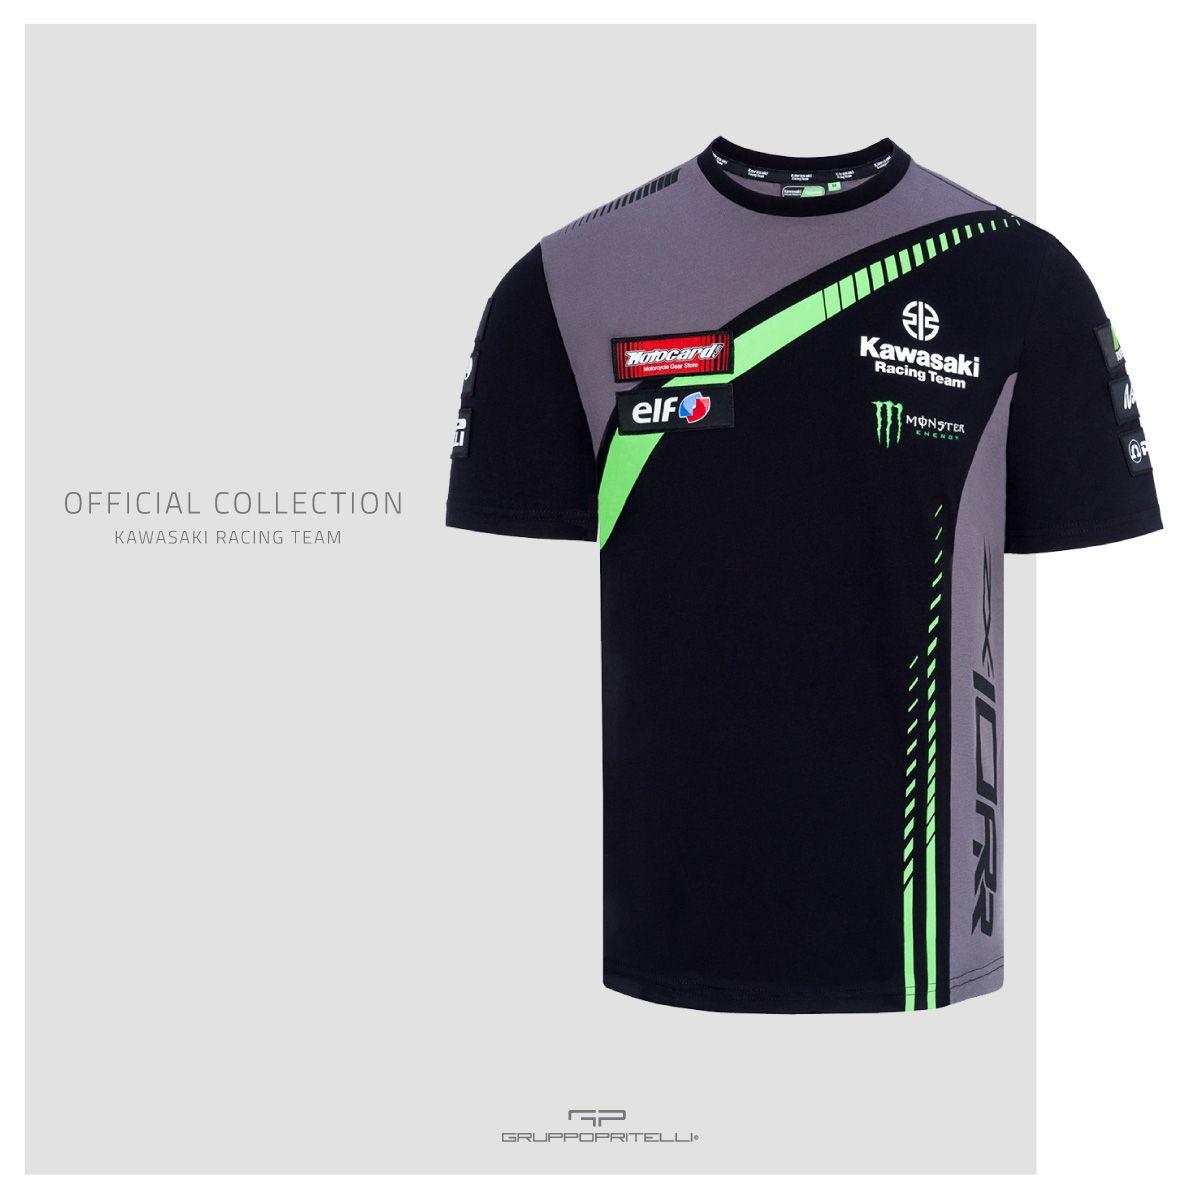 d61db7bec8e Kawasaki Racing Team WorldSBK Official Collection. Replica Clothing ...